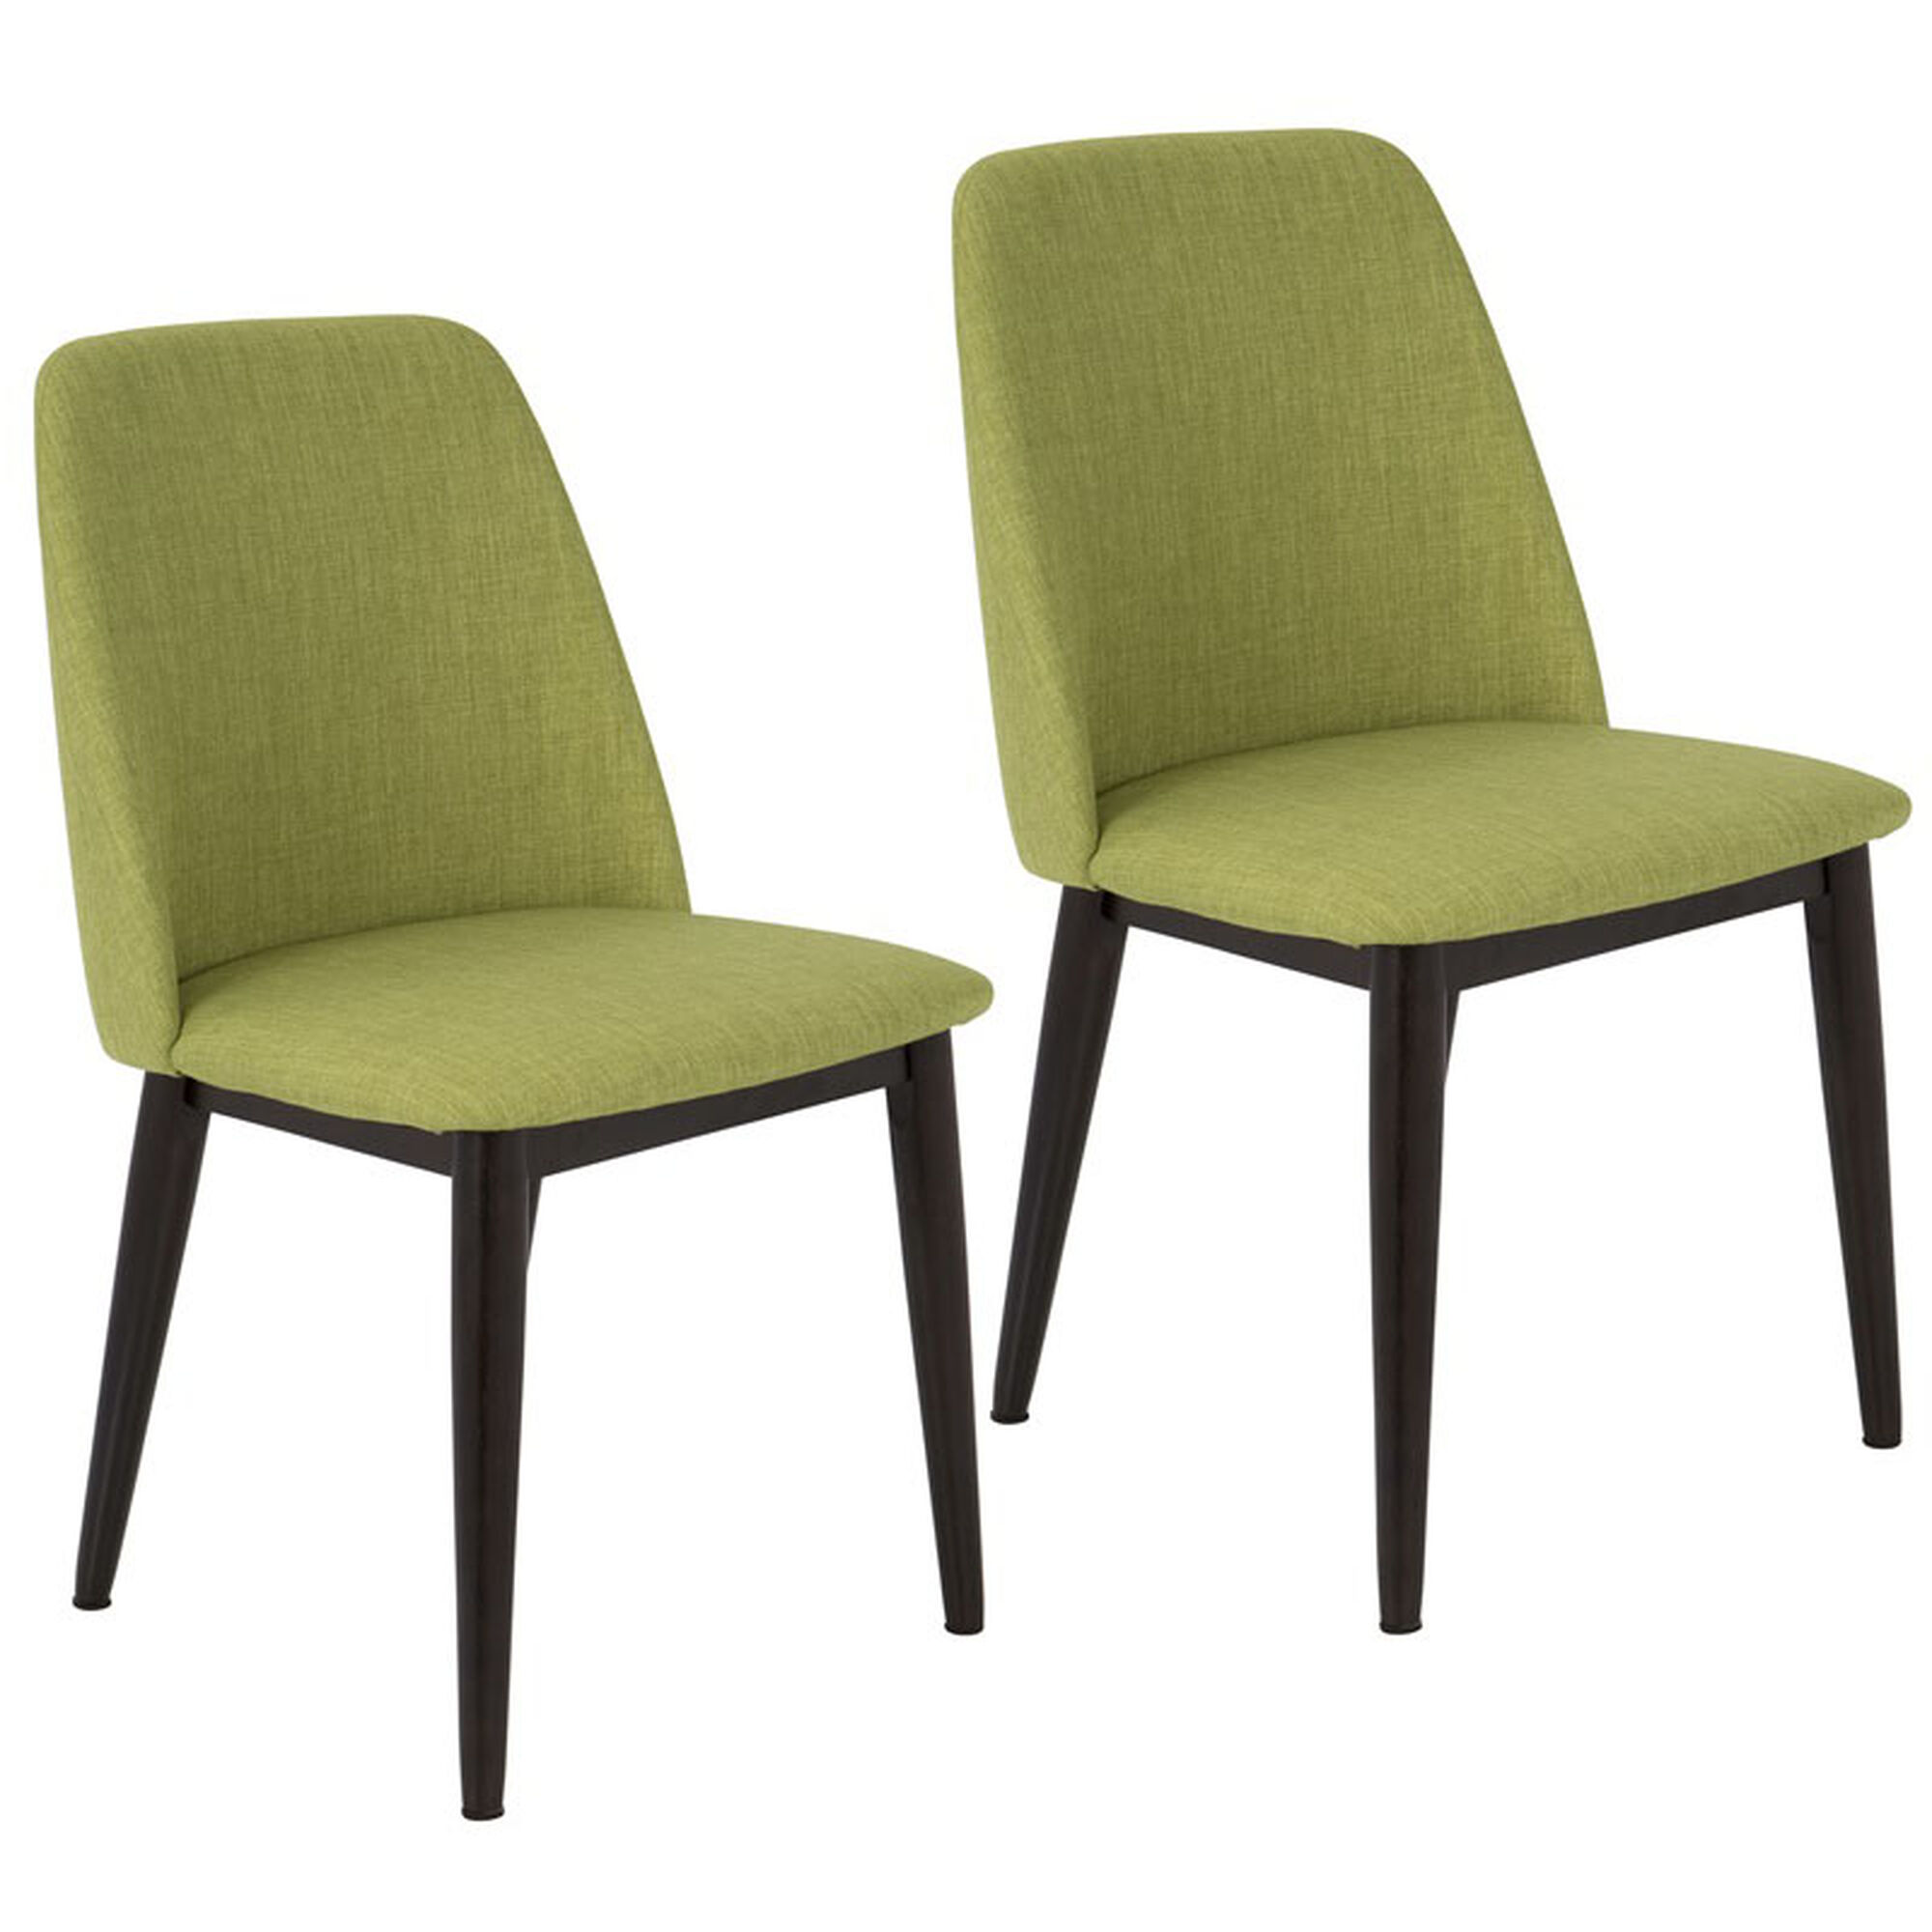 Set Of 2 Green Dining Chairs Chr Tnt Gn Bn2 Bizchaircom